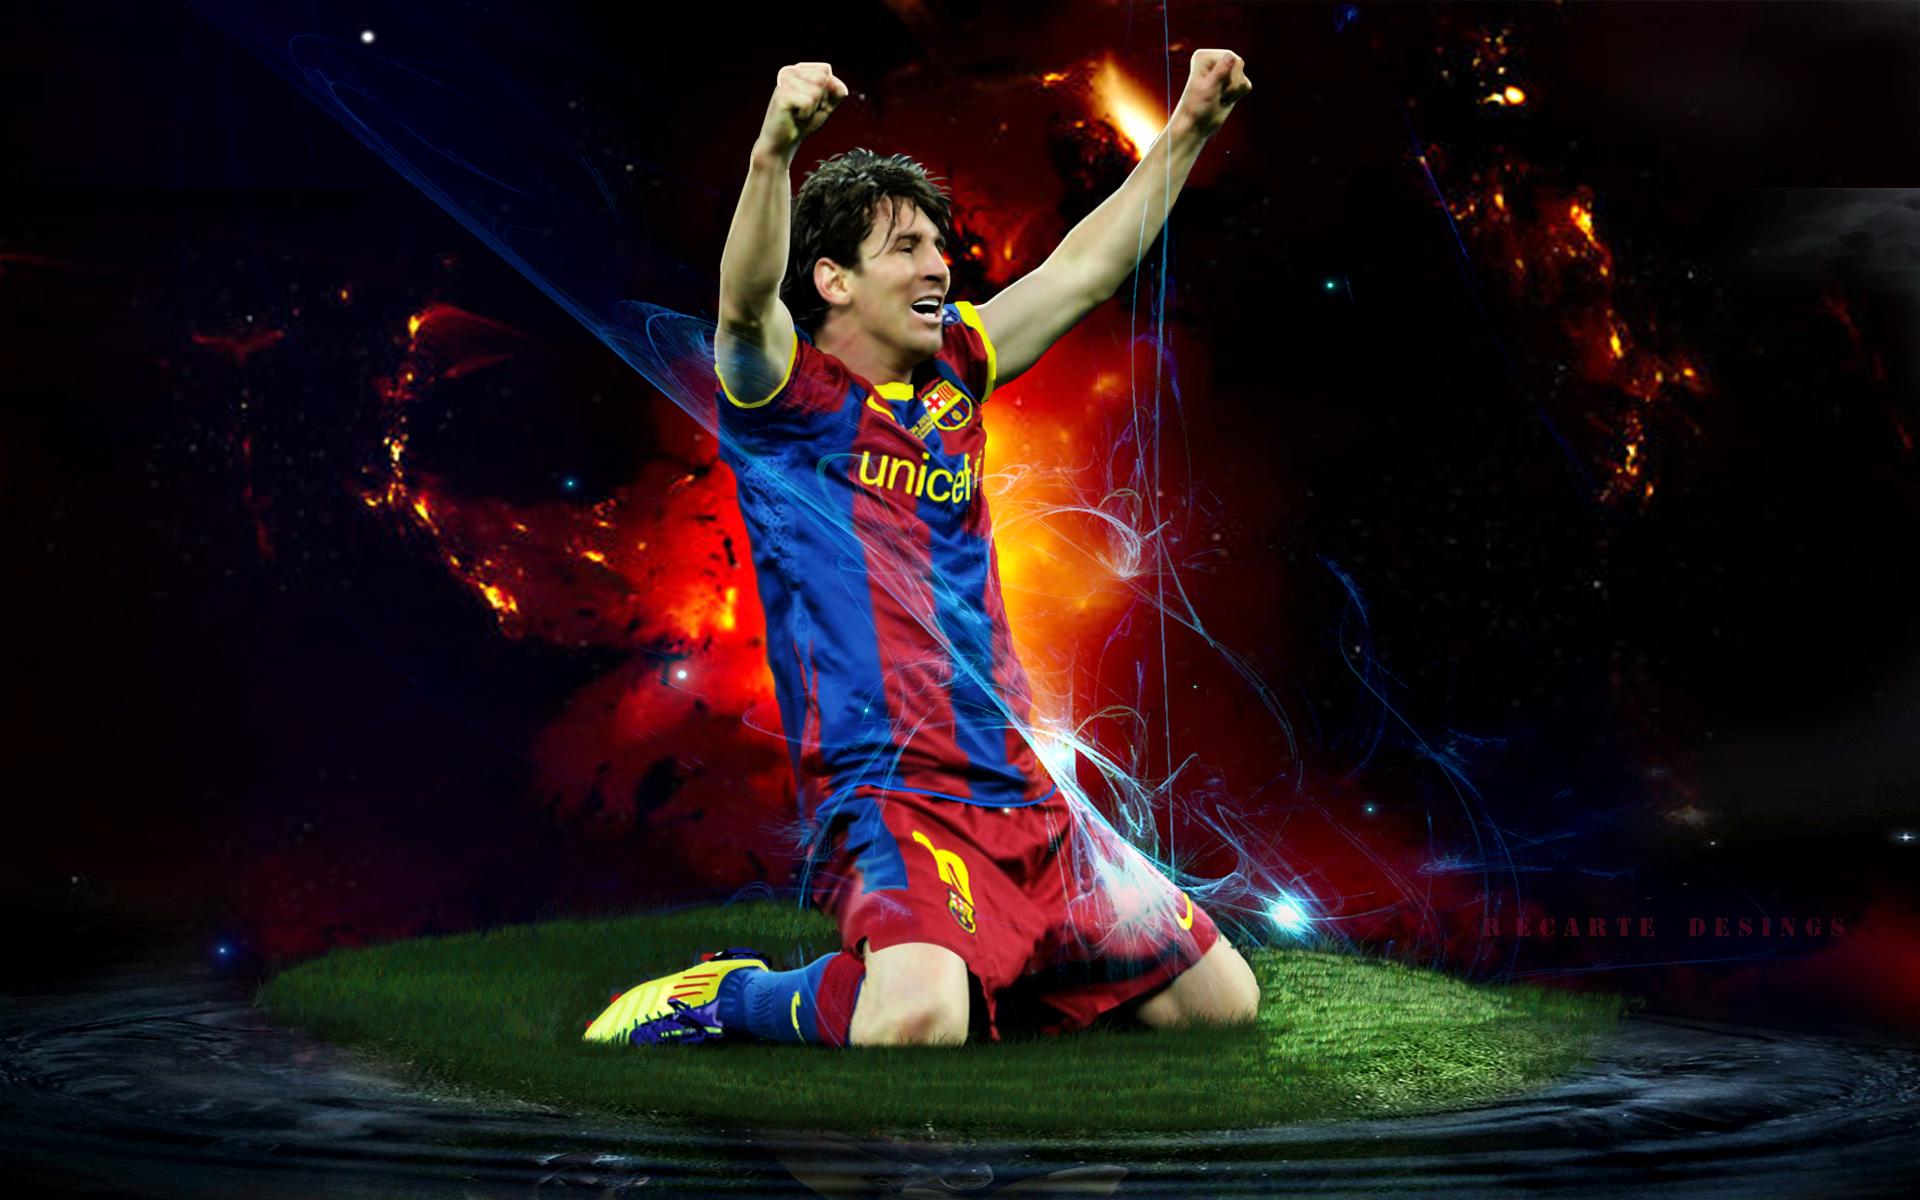 Lionel Messi Celebrate Wallpaper Download 10882 Wallpaper High 1920x1200